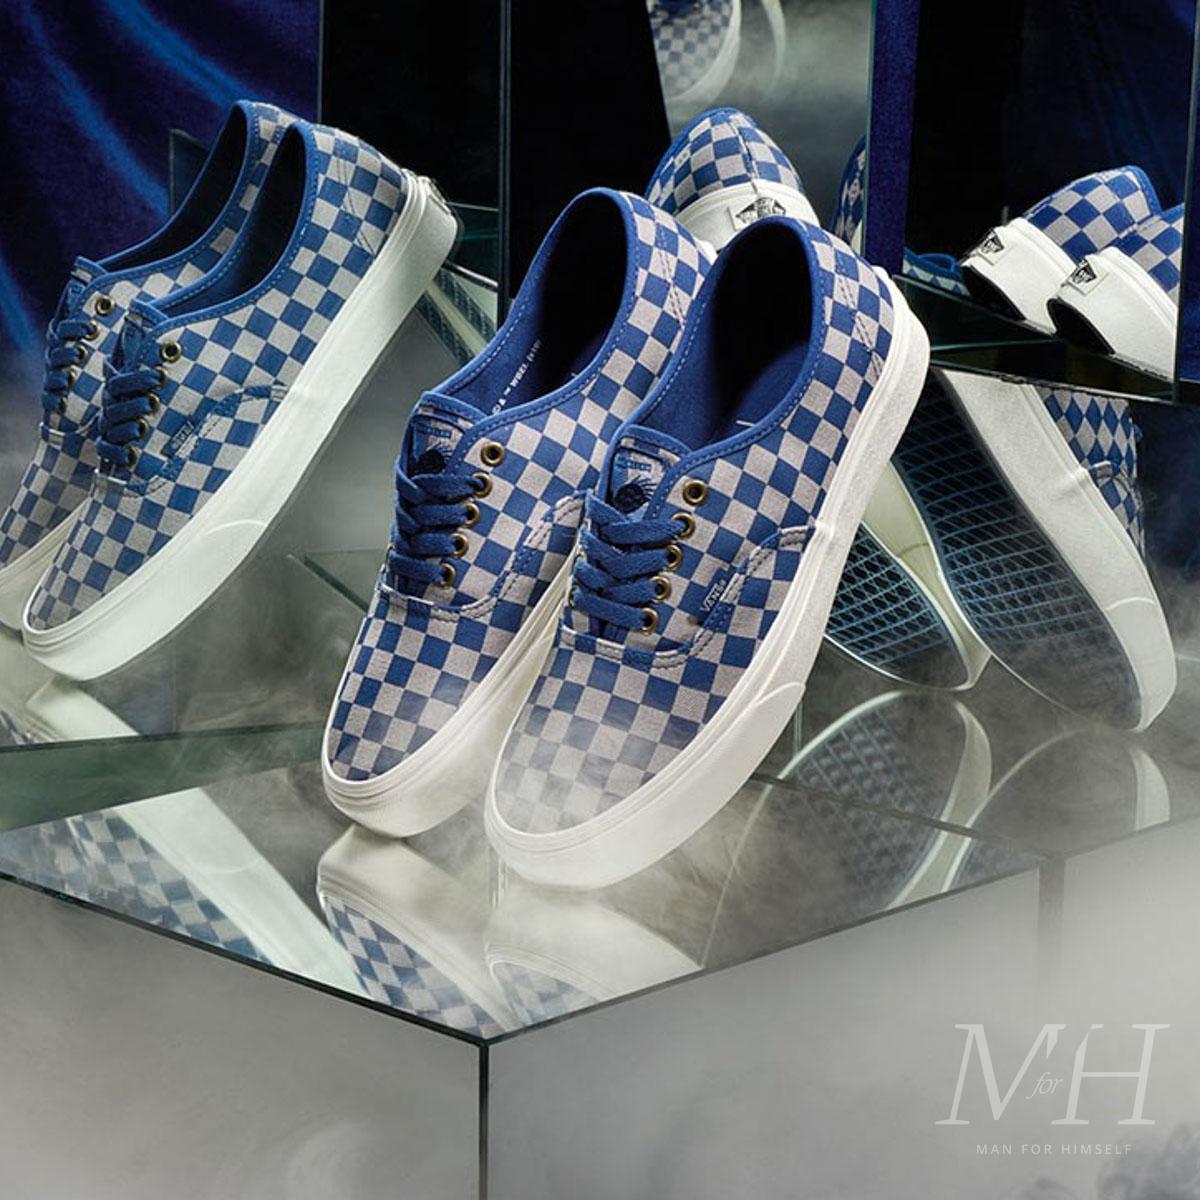 vans-harry-potter-footwear-collection-man-for-himself